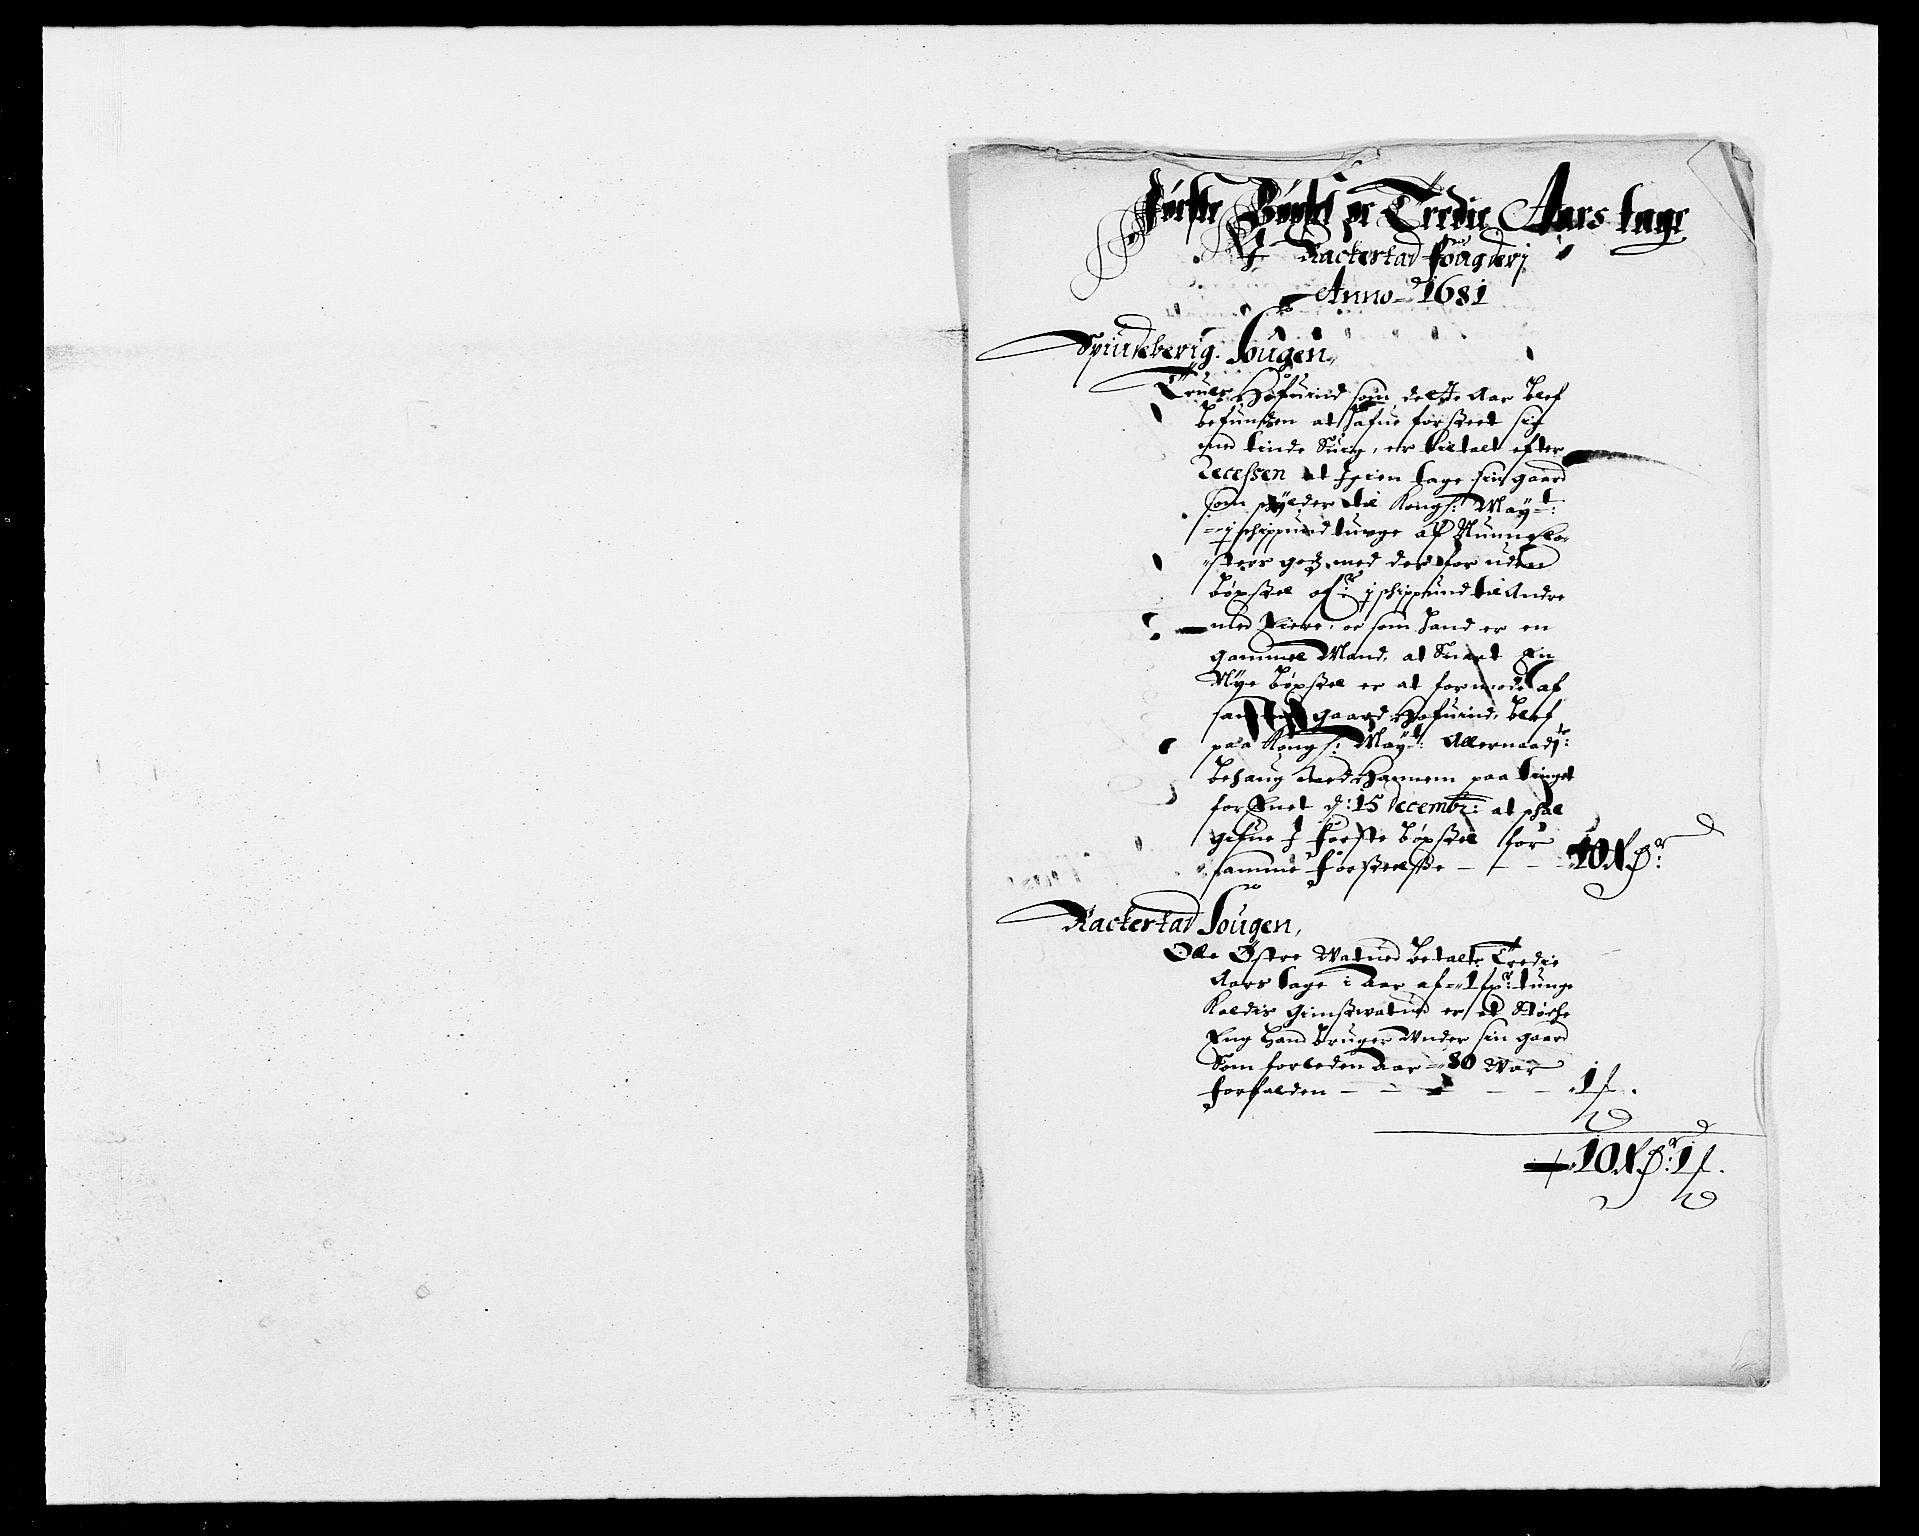 RA, Rentekammeret inntil 1814, Reviderte regnskaper, Fogderegnskap, R05/L0272: Fogderegnskap Rakkestad, 1680-1681, s. 252